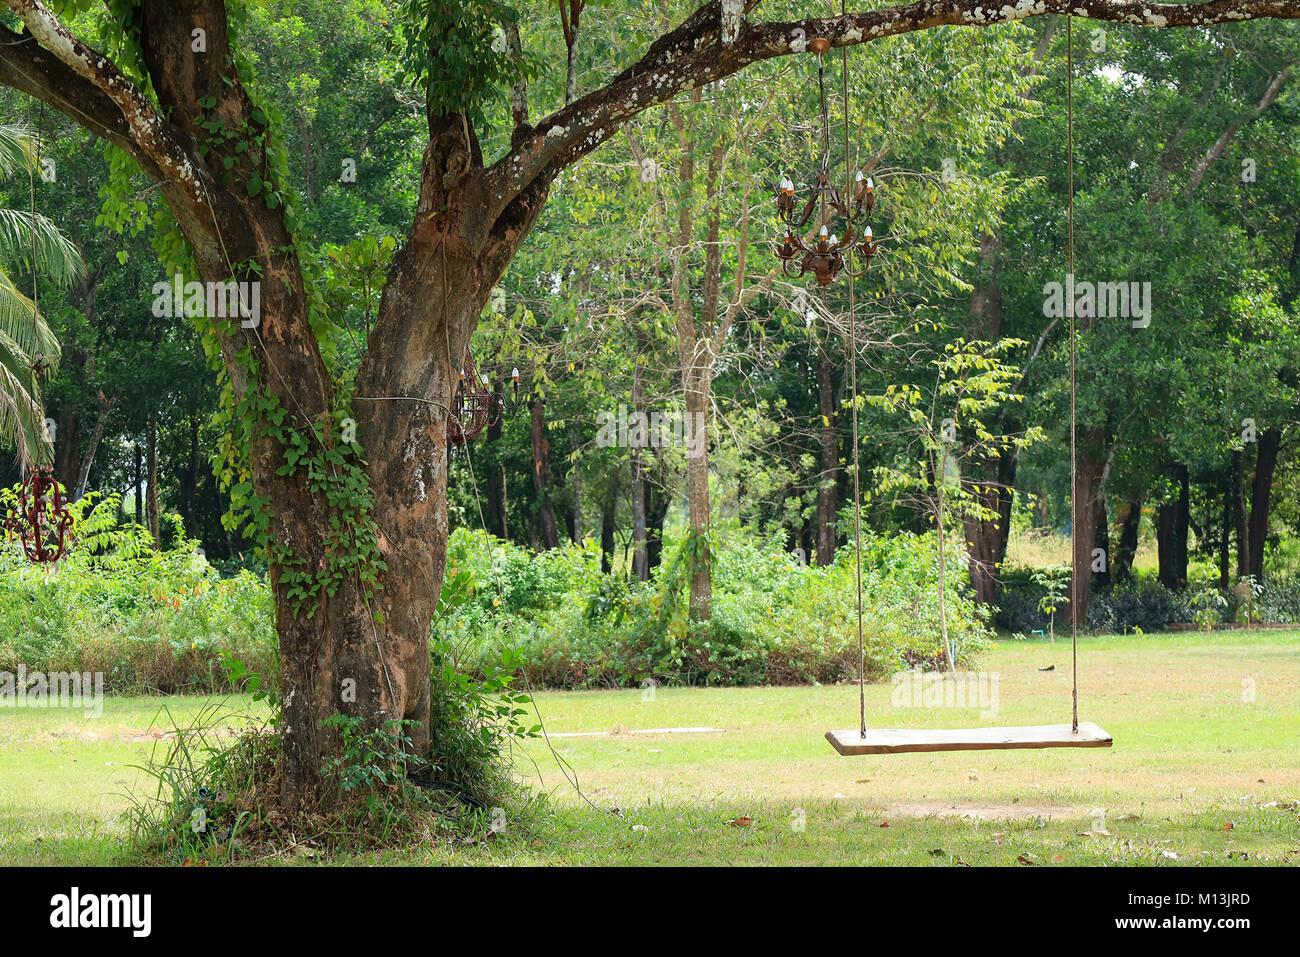 wooden swing tree stockfotos wooden swing tree bilder alamy. Black Bedroom Furniture Sets. Home Design Ideas